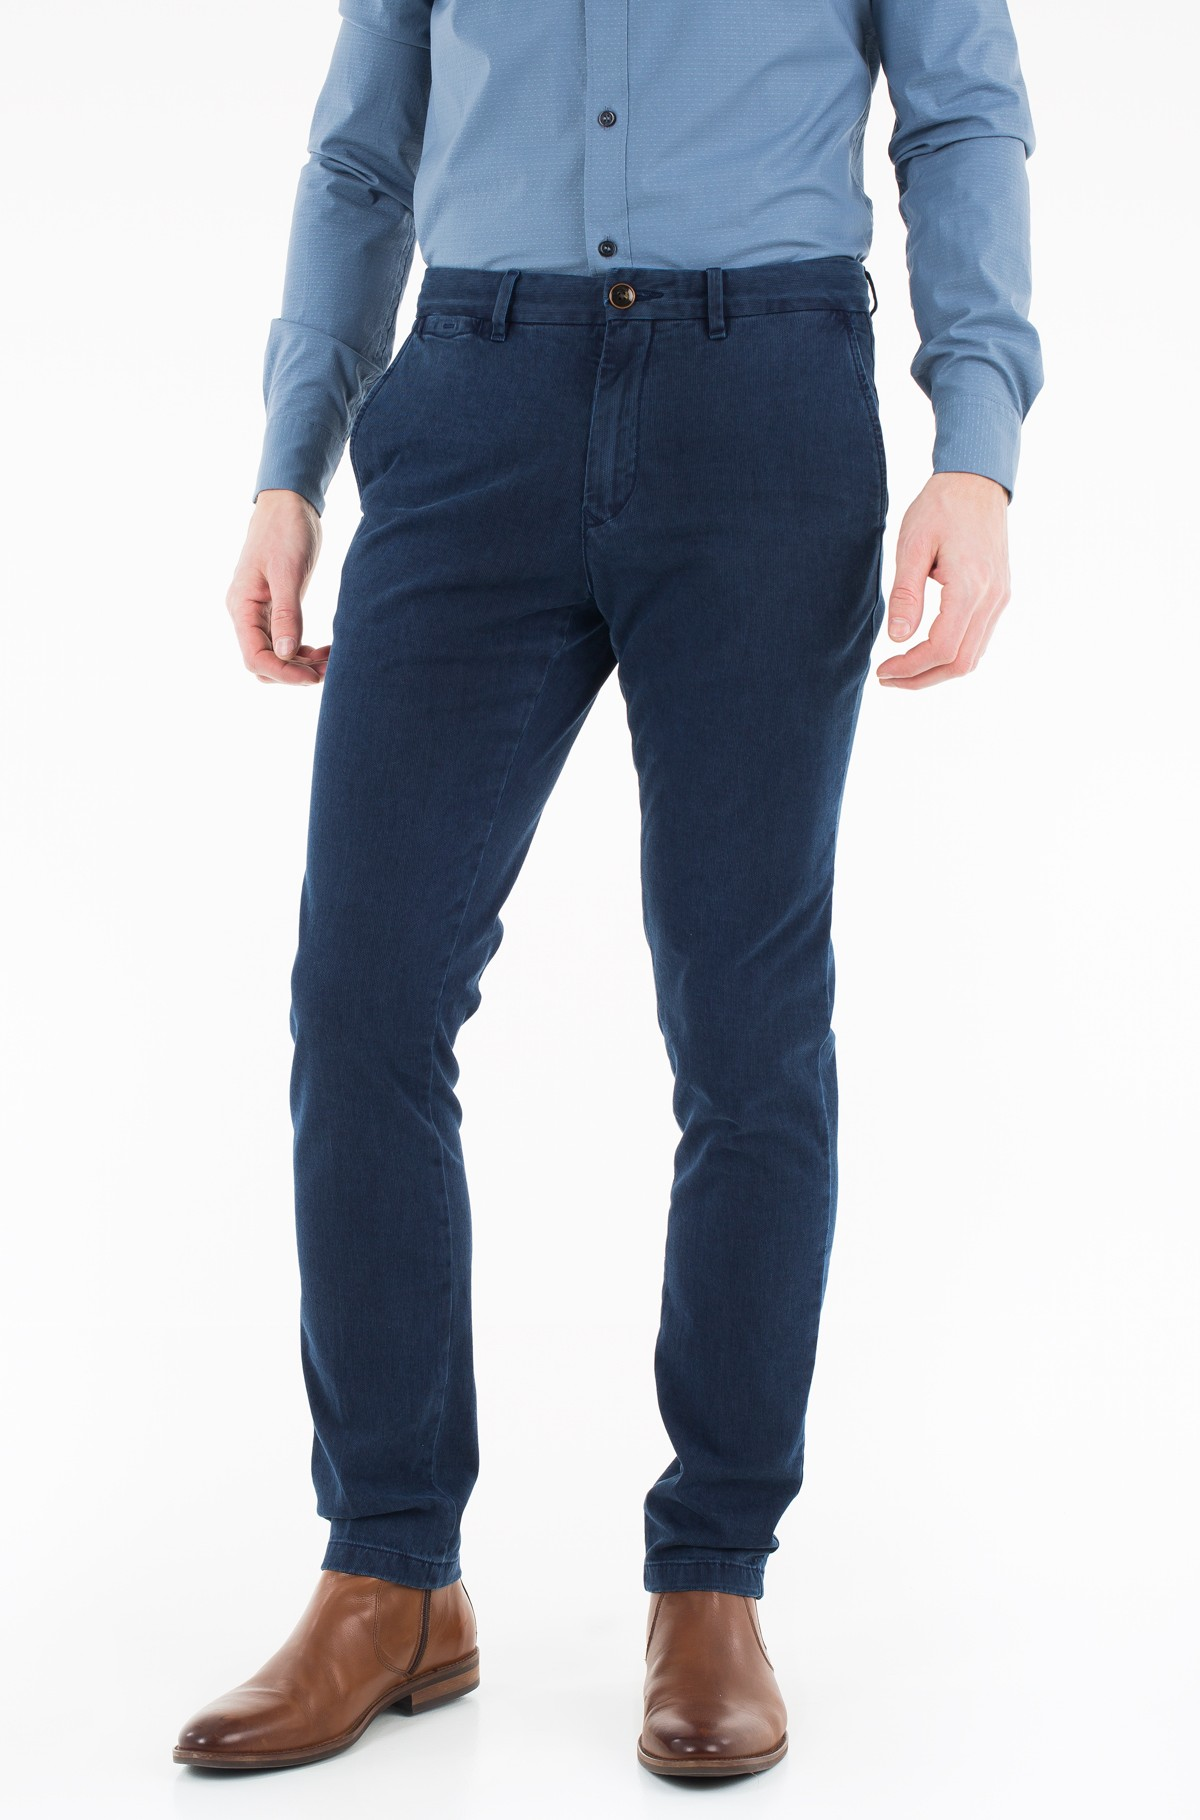 Trousers Denton Chino Stripe Sulphur Dye-full-1